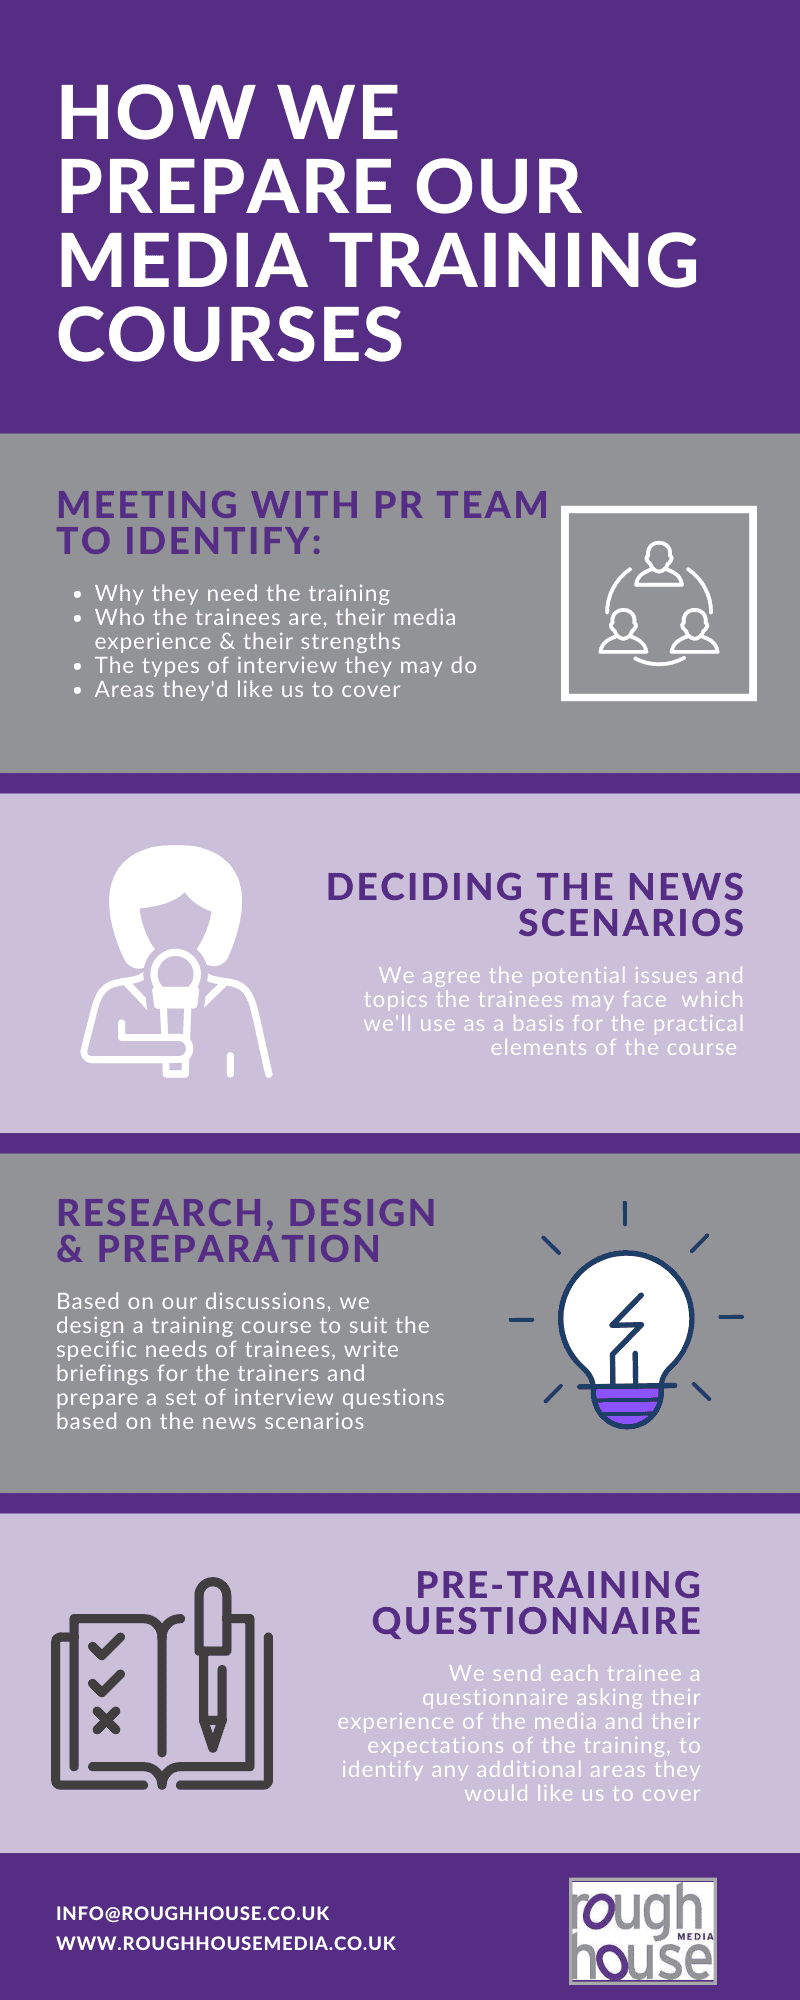 How we prepare for media training courses